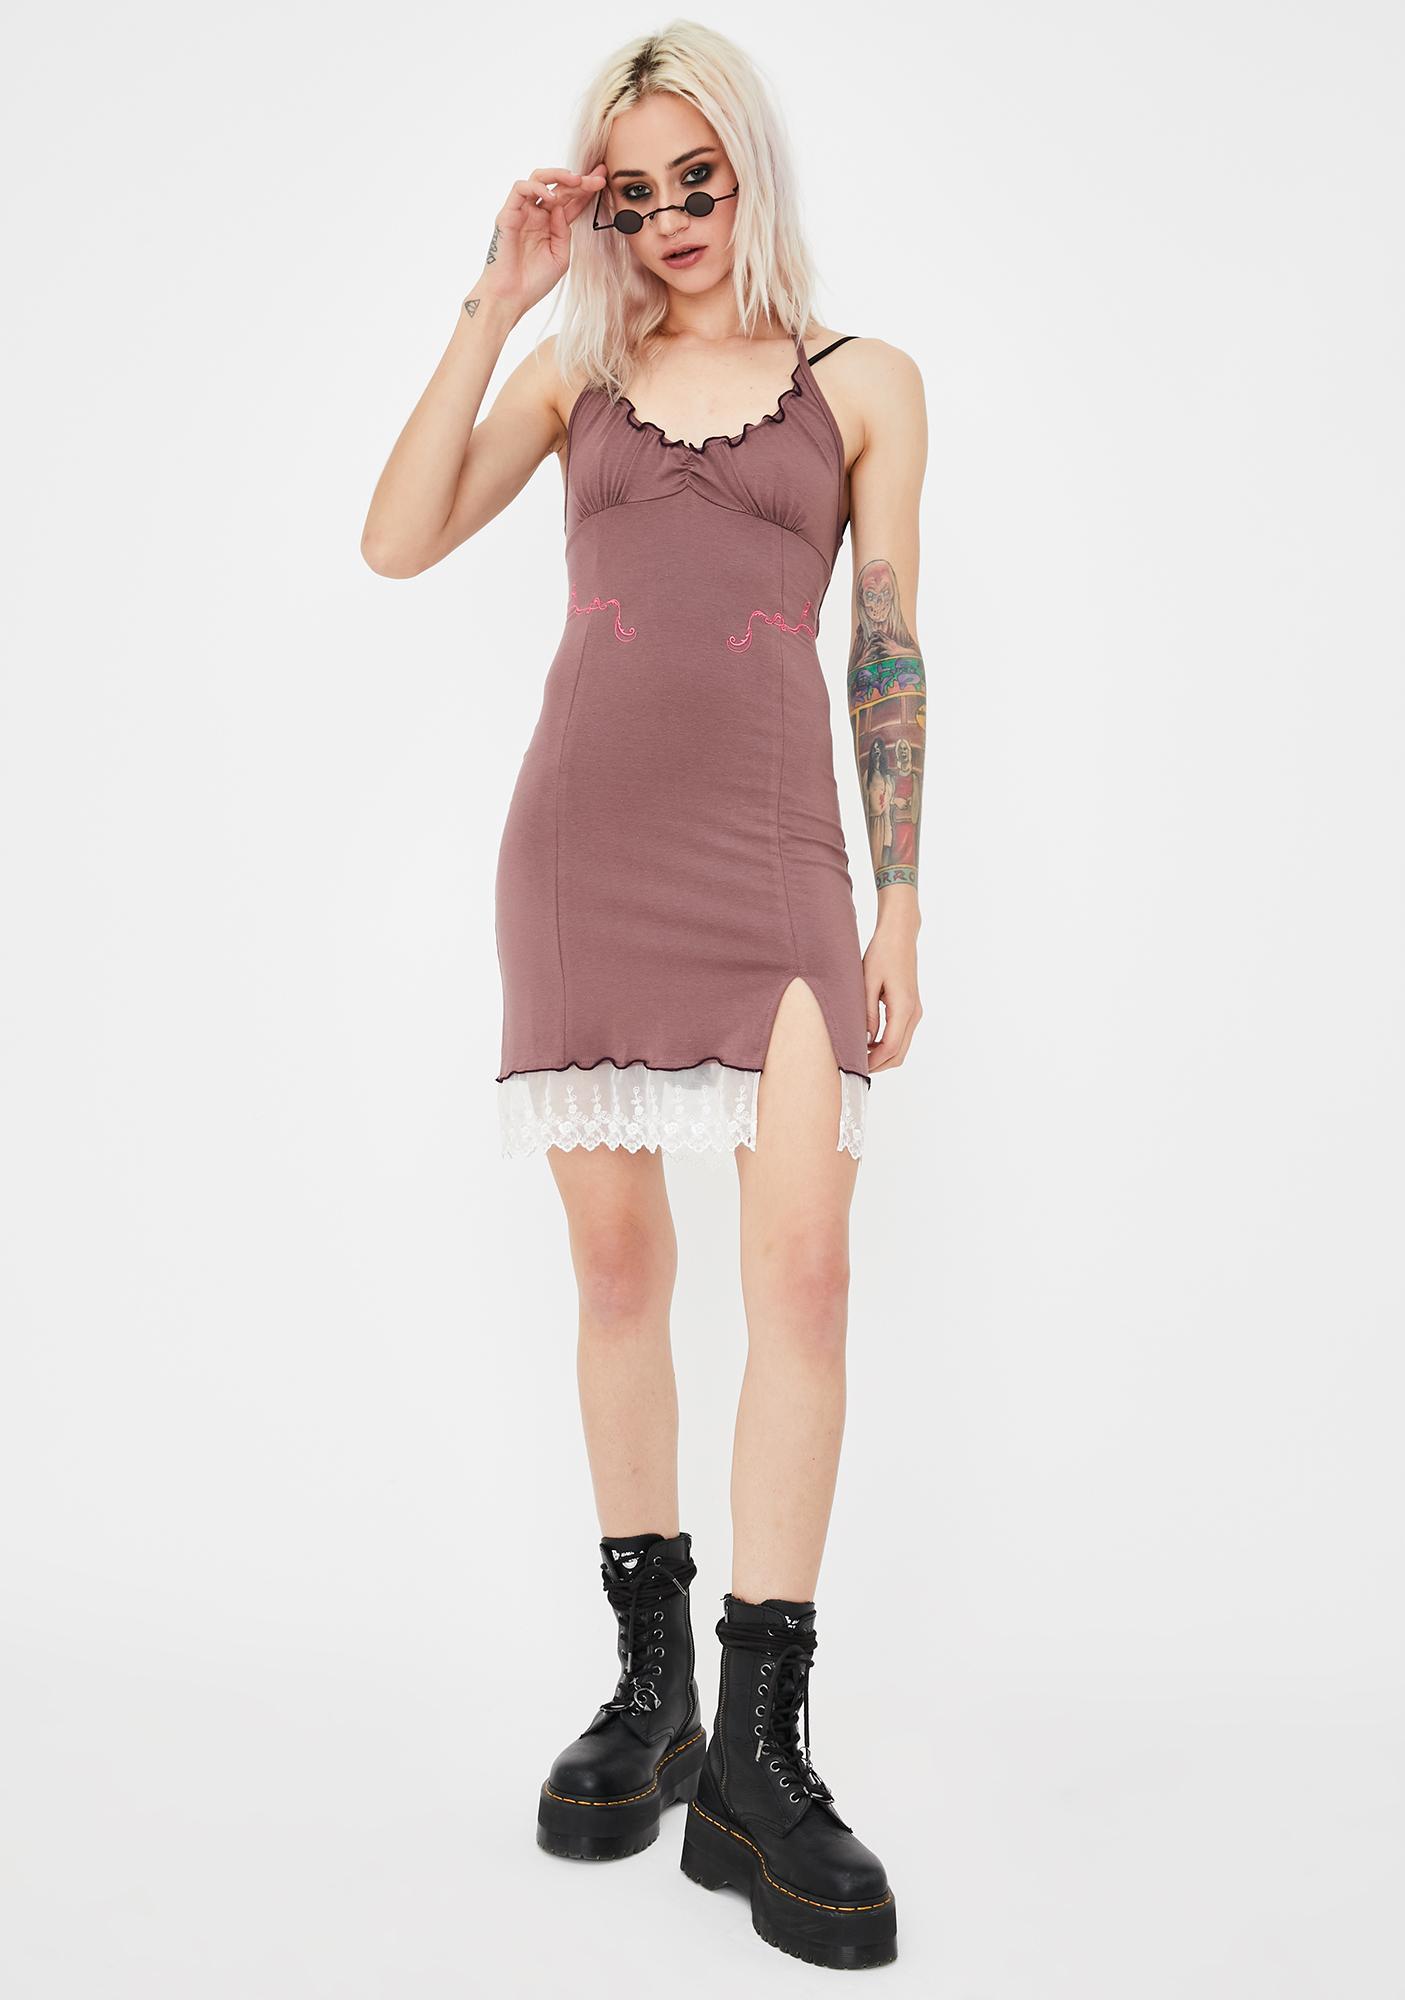 GANGYOUNG Tan XSX Mini Dress